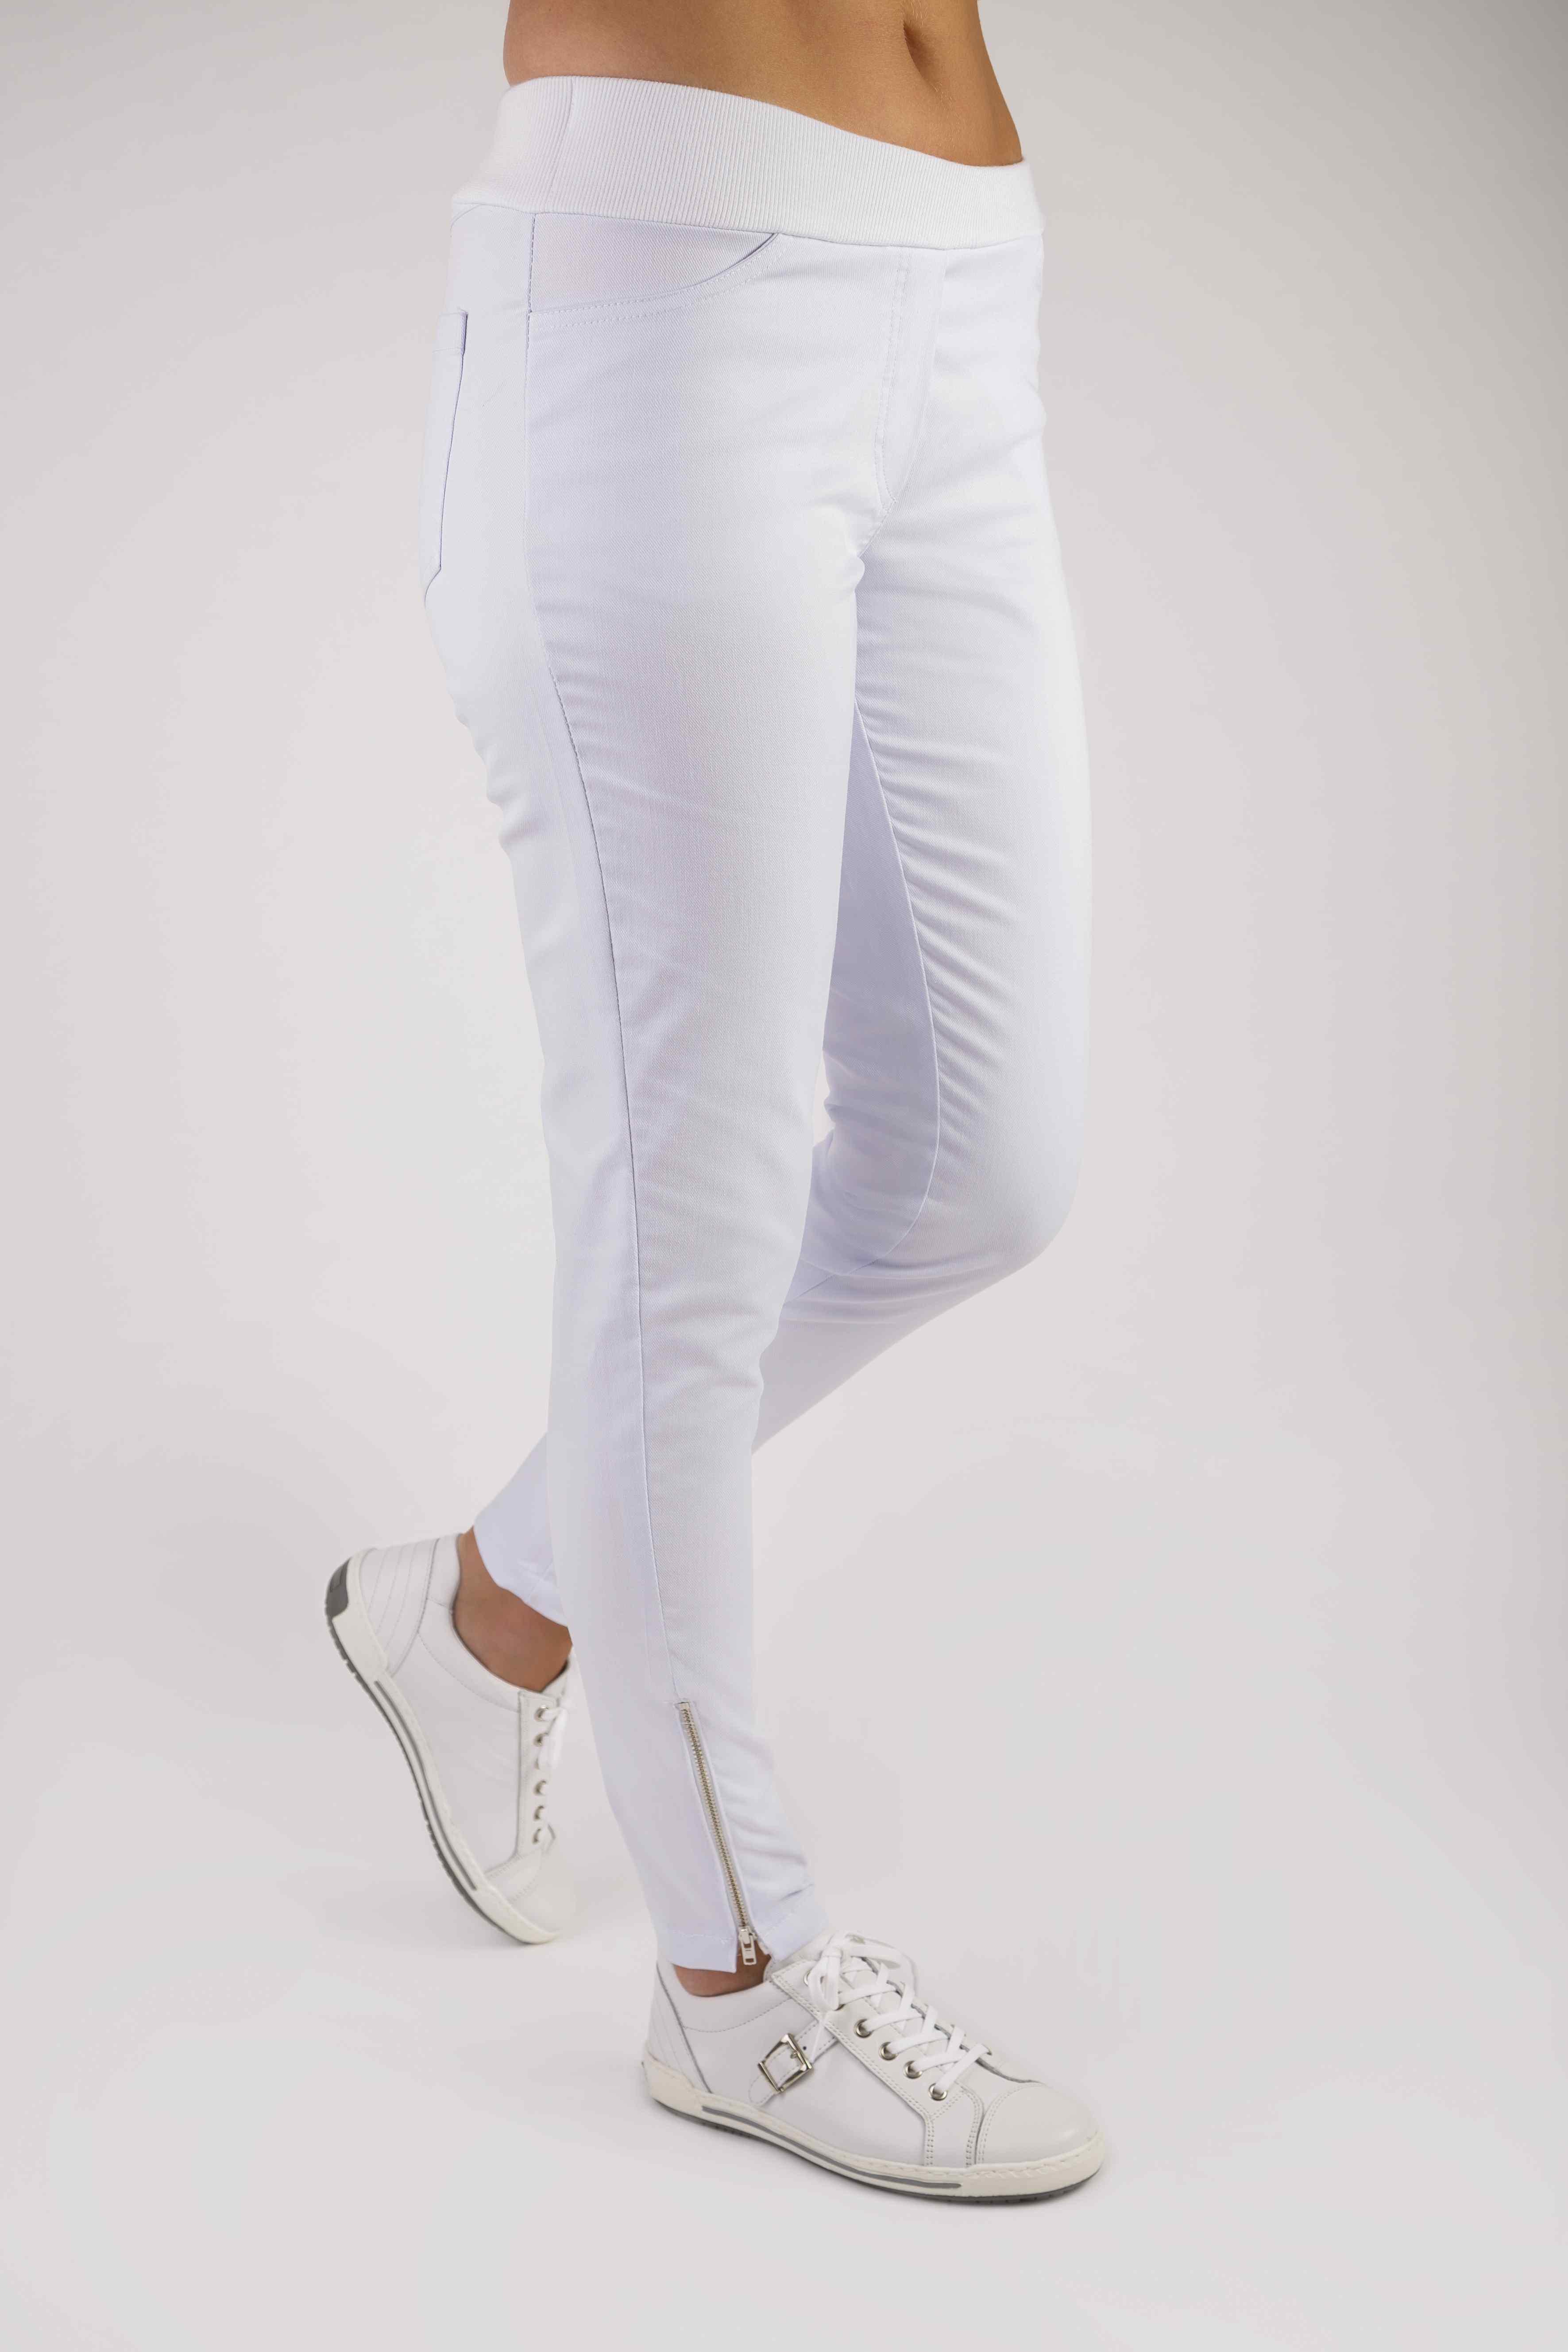 KIM dámské elastické kalhoty - bílé Dámské elastické kalhoty s úpletem